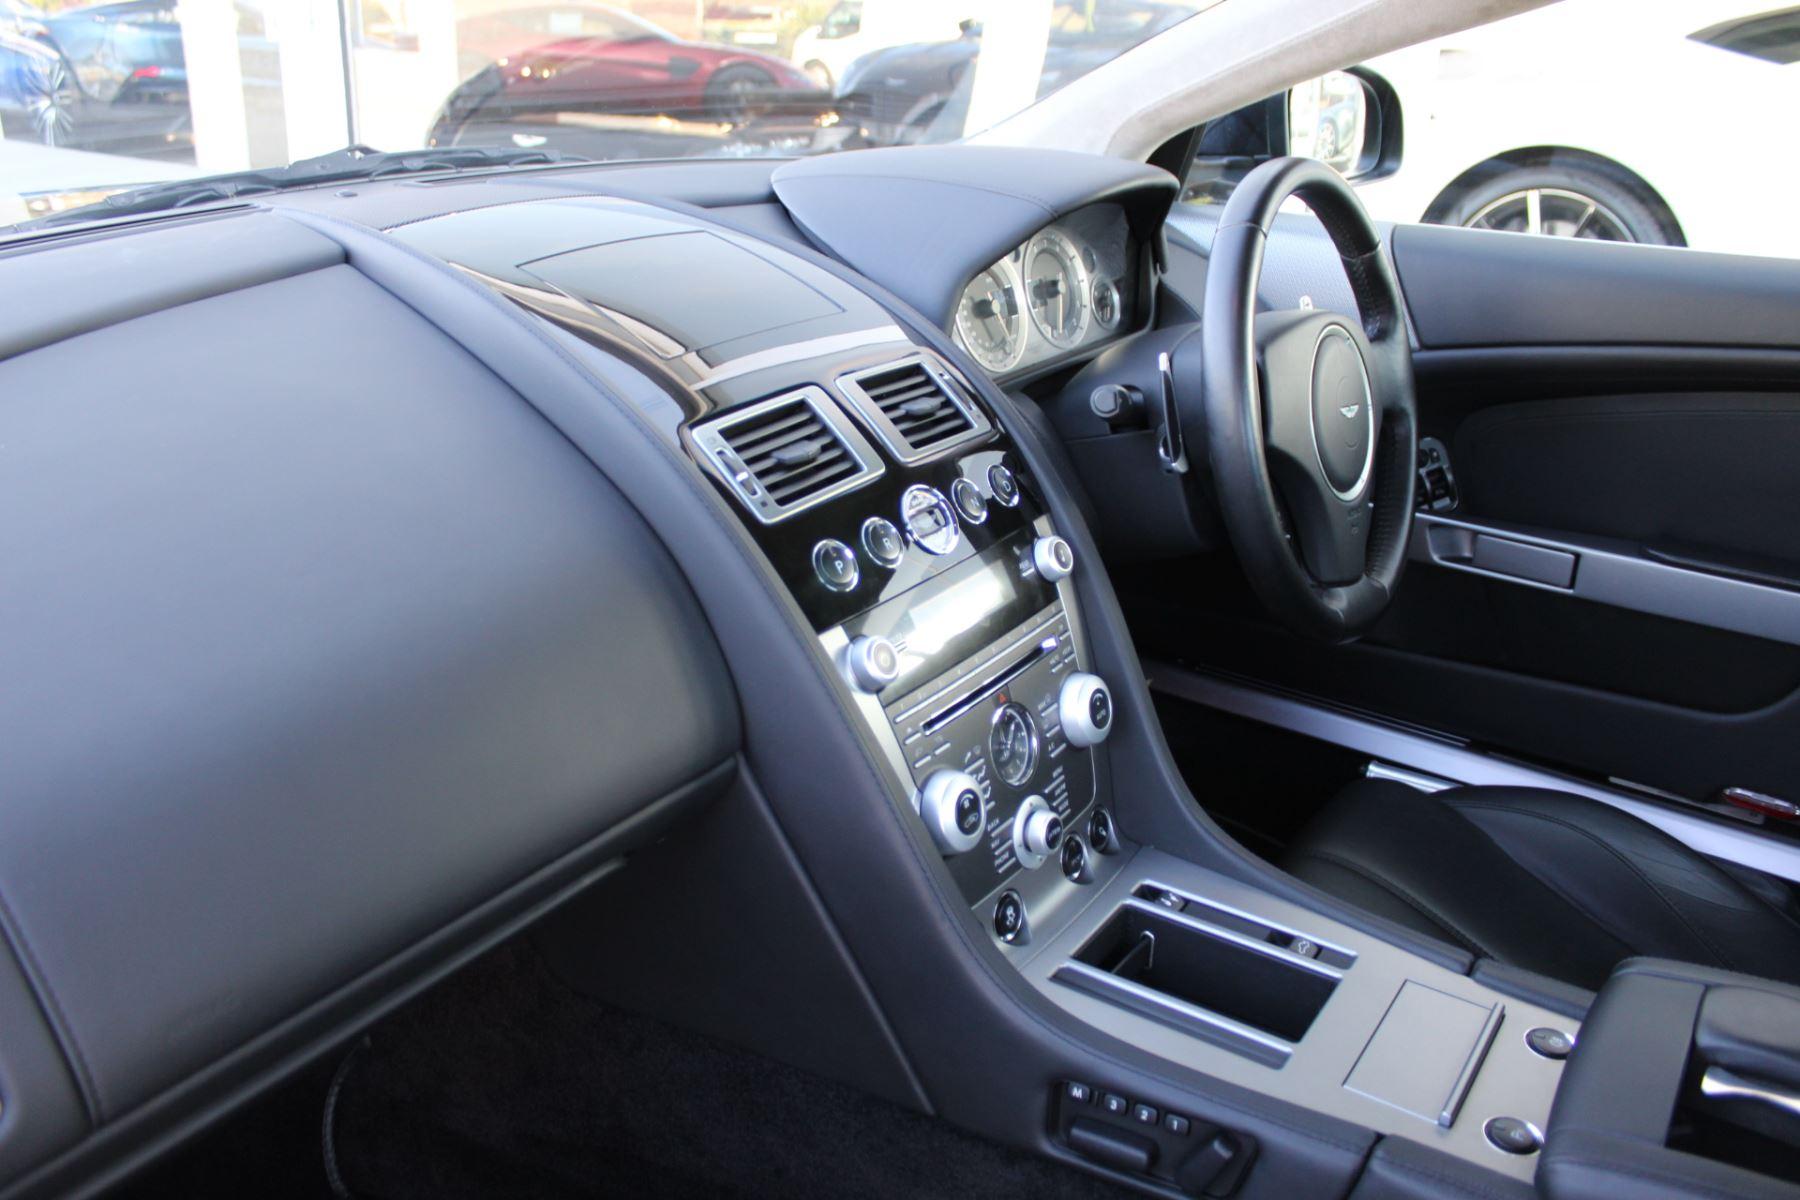 Aston Martin DB9 V12 2dr Touchtronic [470] image 12